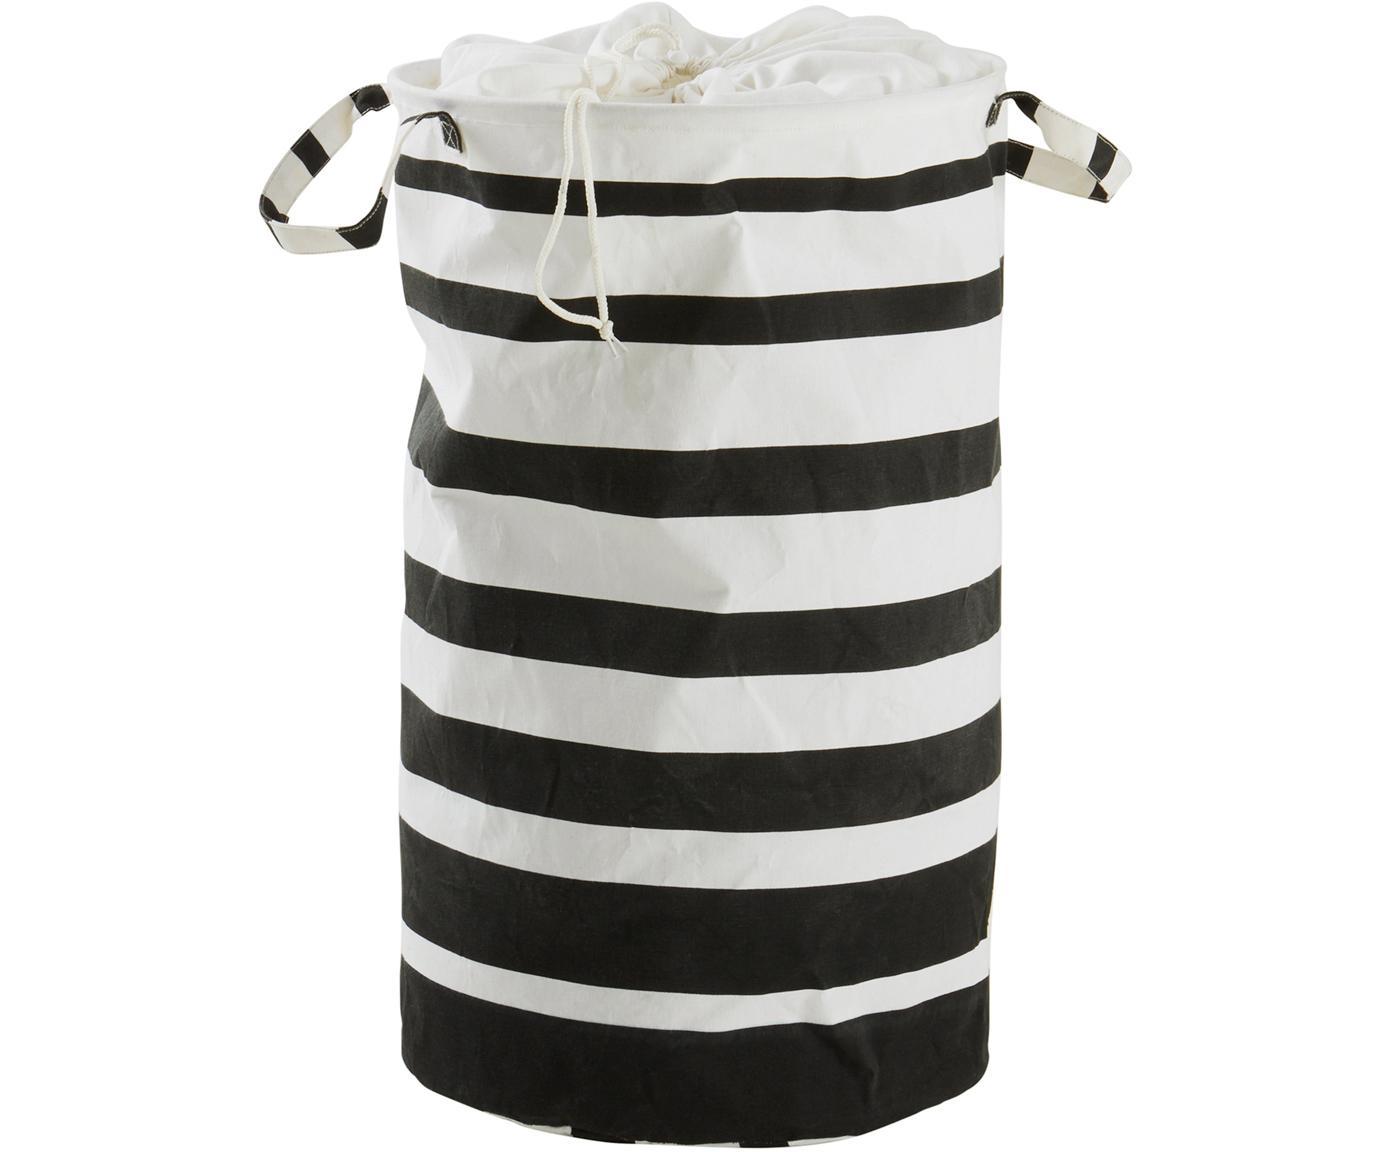 Cesta de ropa Amore, Algodón, polipropileno, Negro, blanco, Ø 40 x Al 70 cm